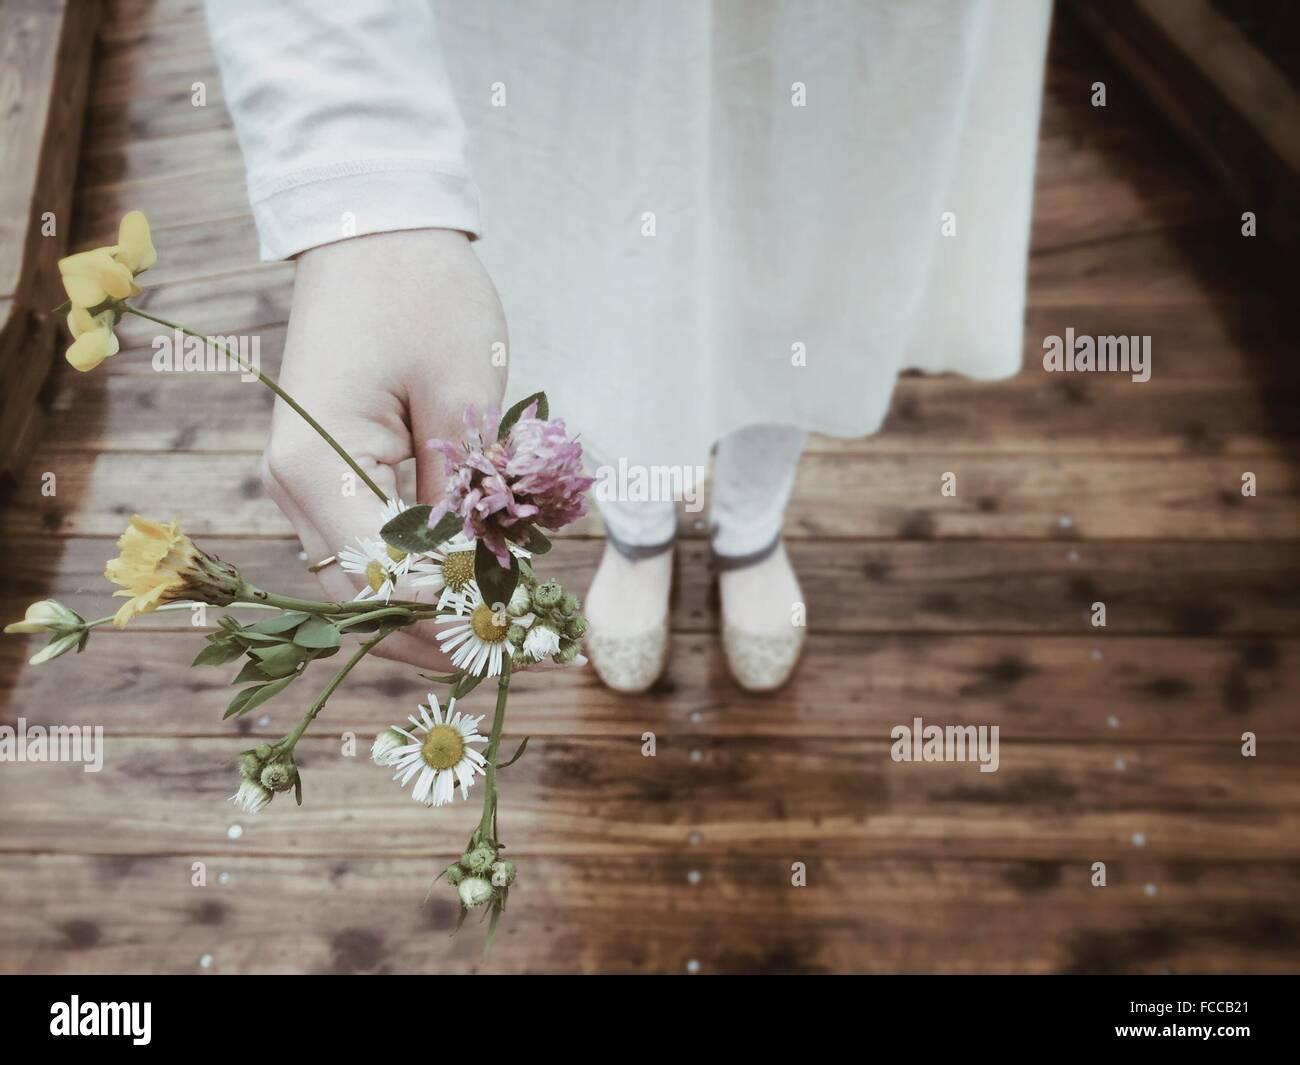 Woman Standing On Boardwalk Holding Flowers Stock Photo